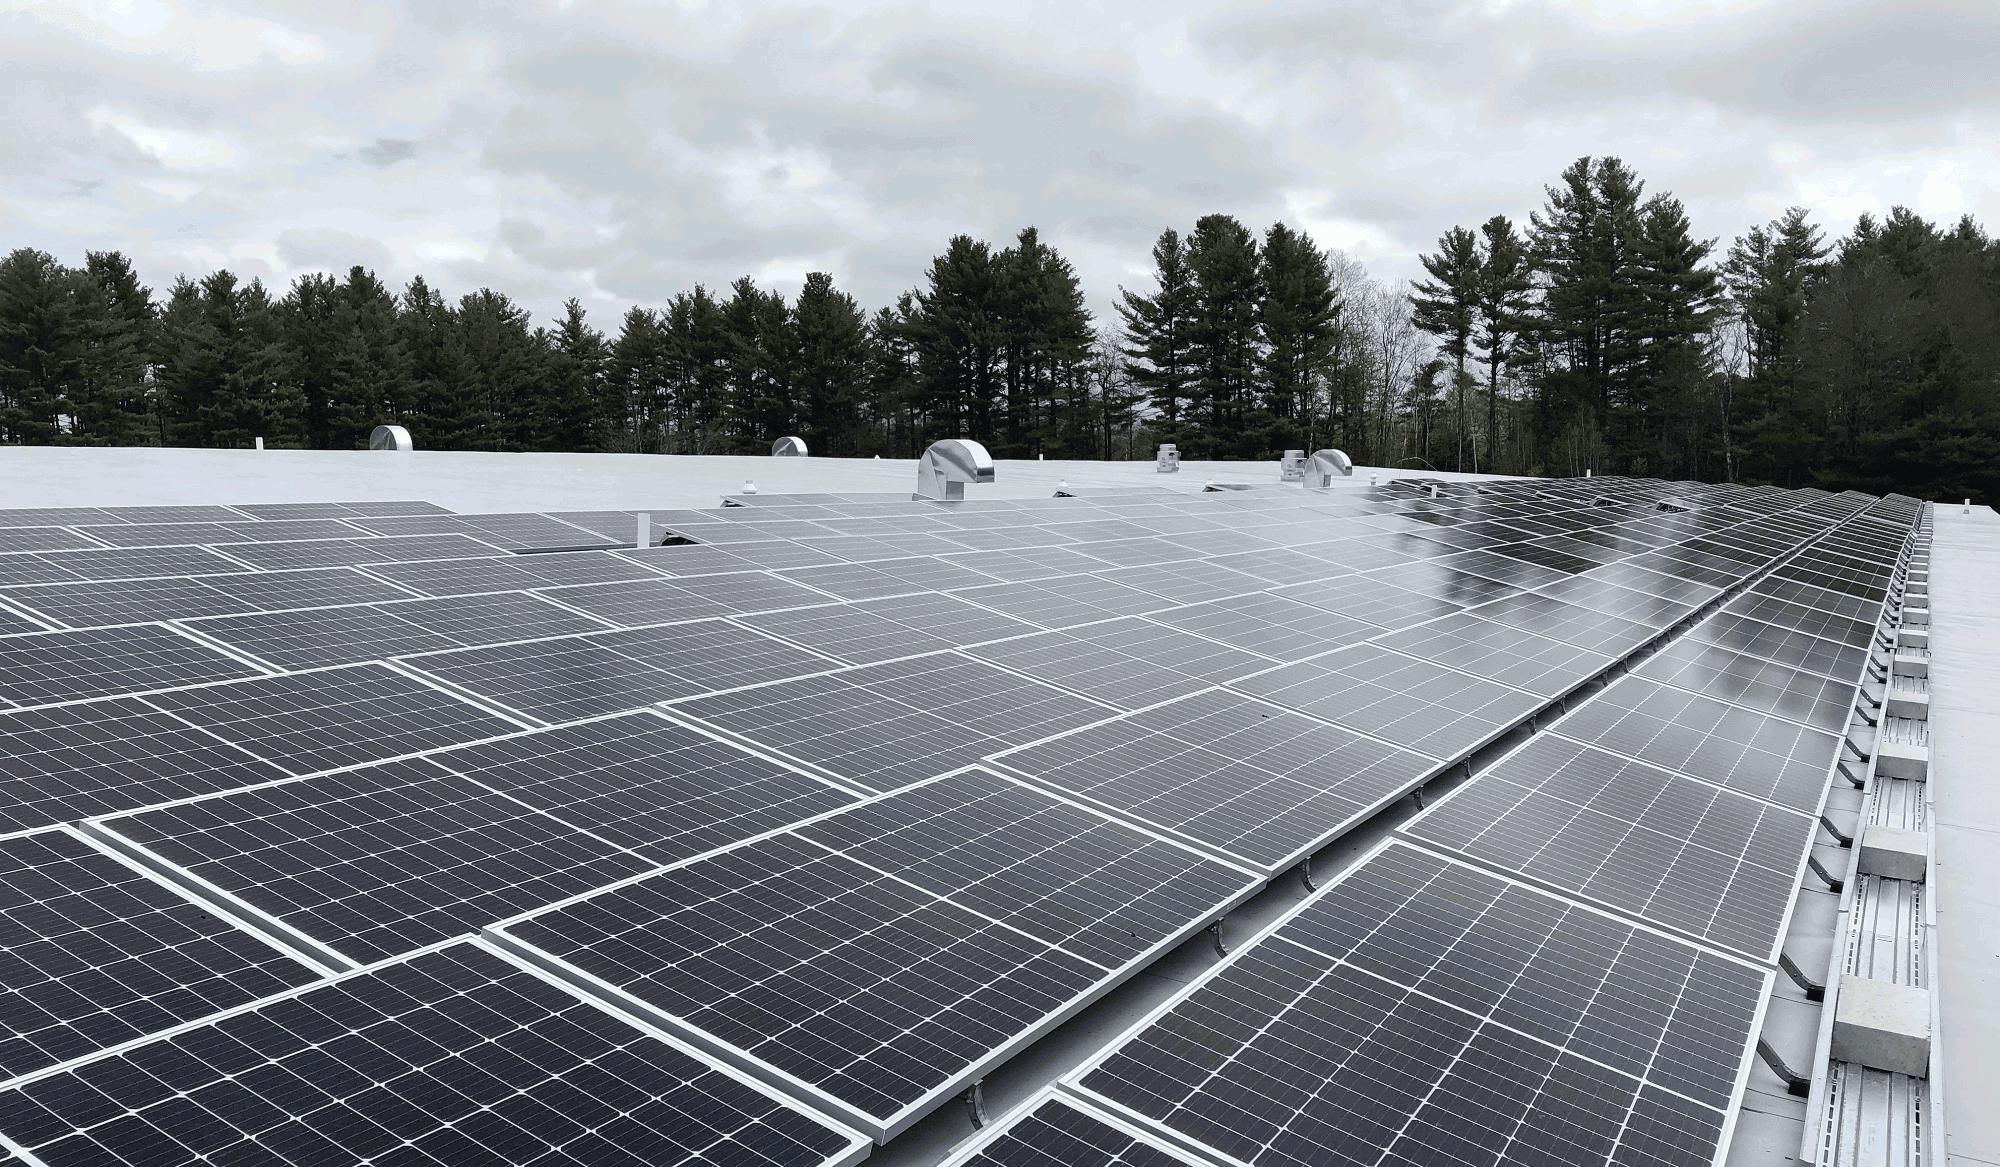 Runamok Maple Solar Powered Facility